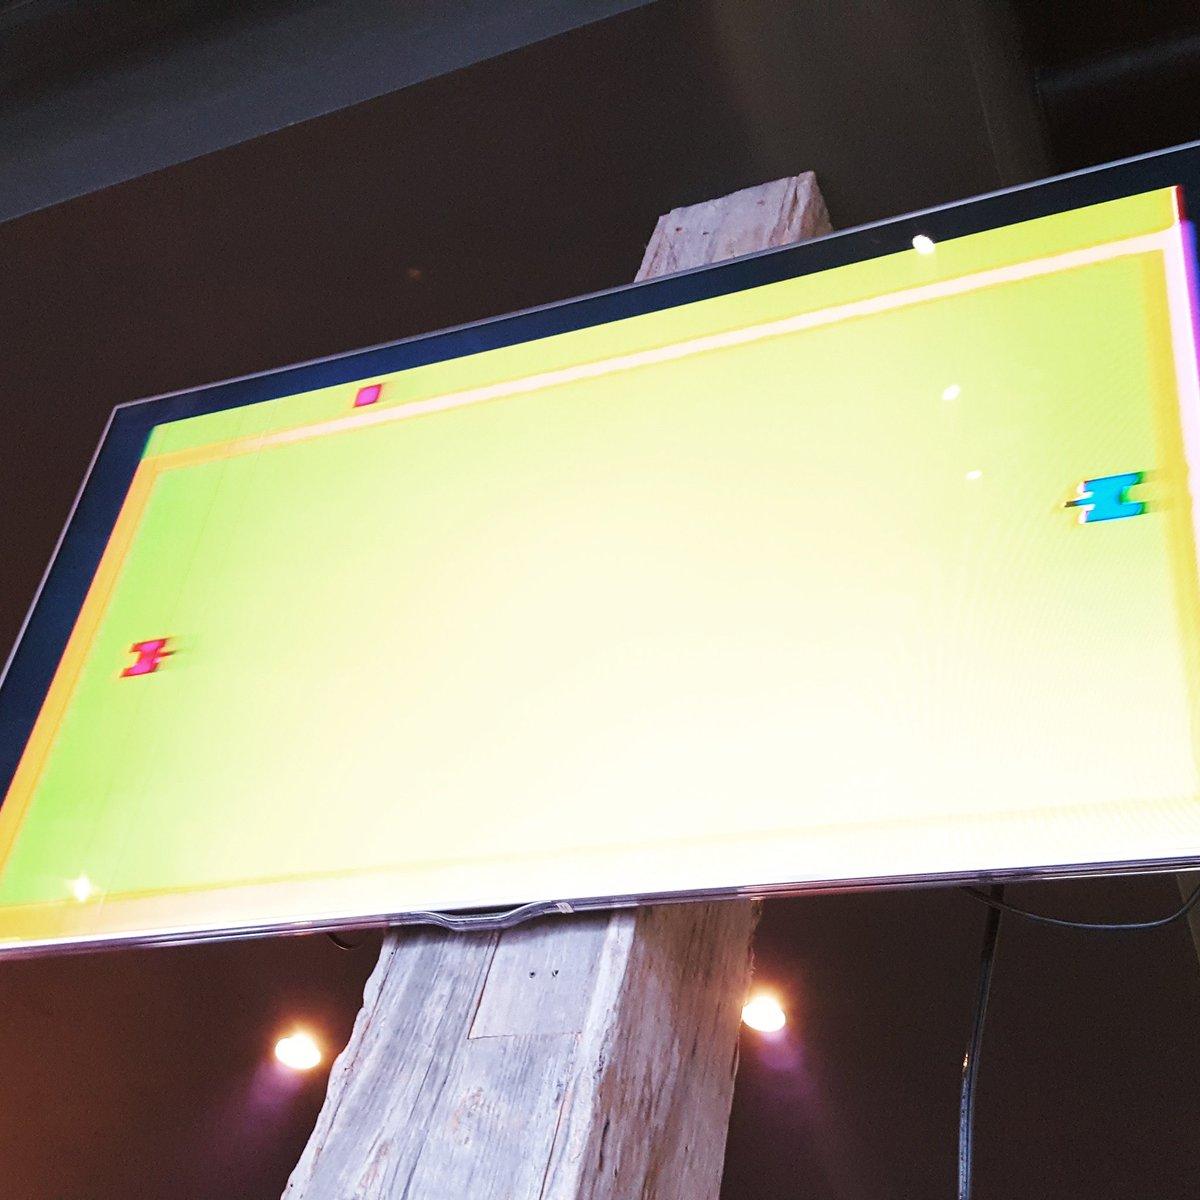 #atari on the big screen #gaming #RETROGAMING